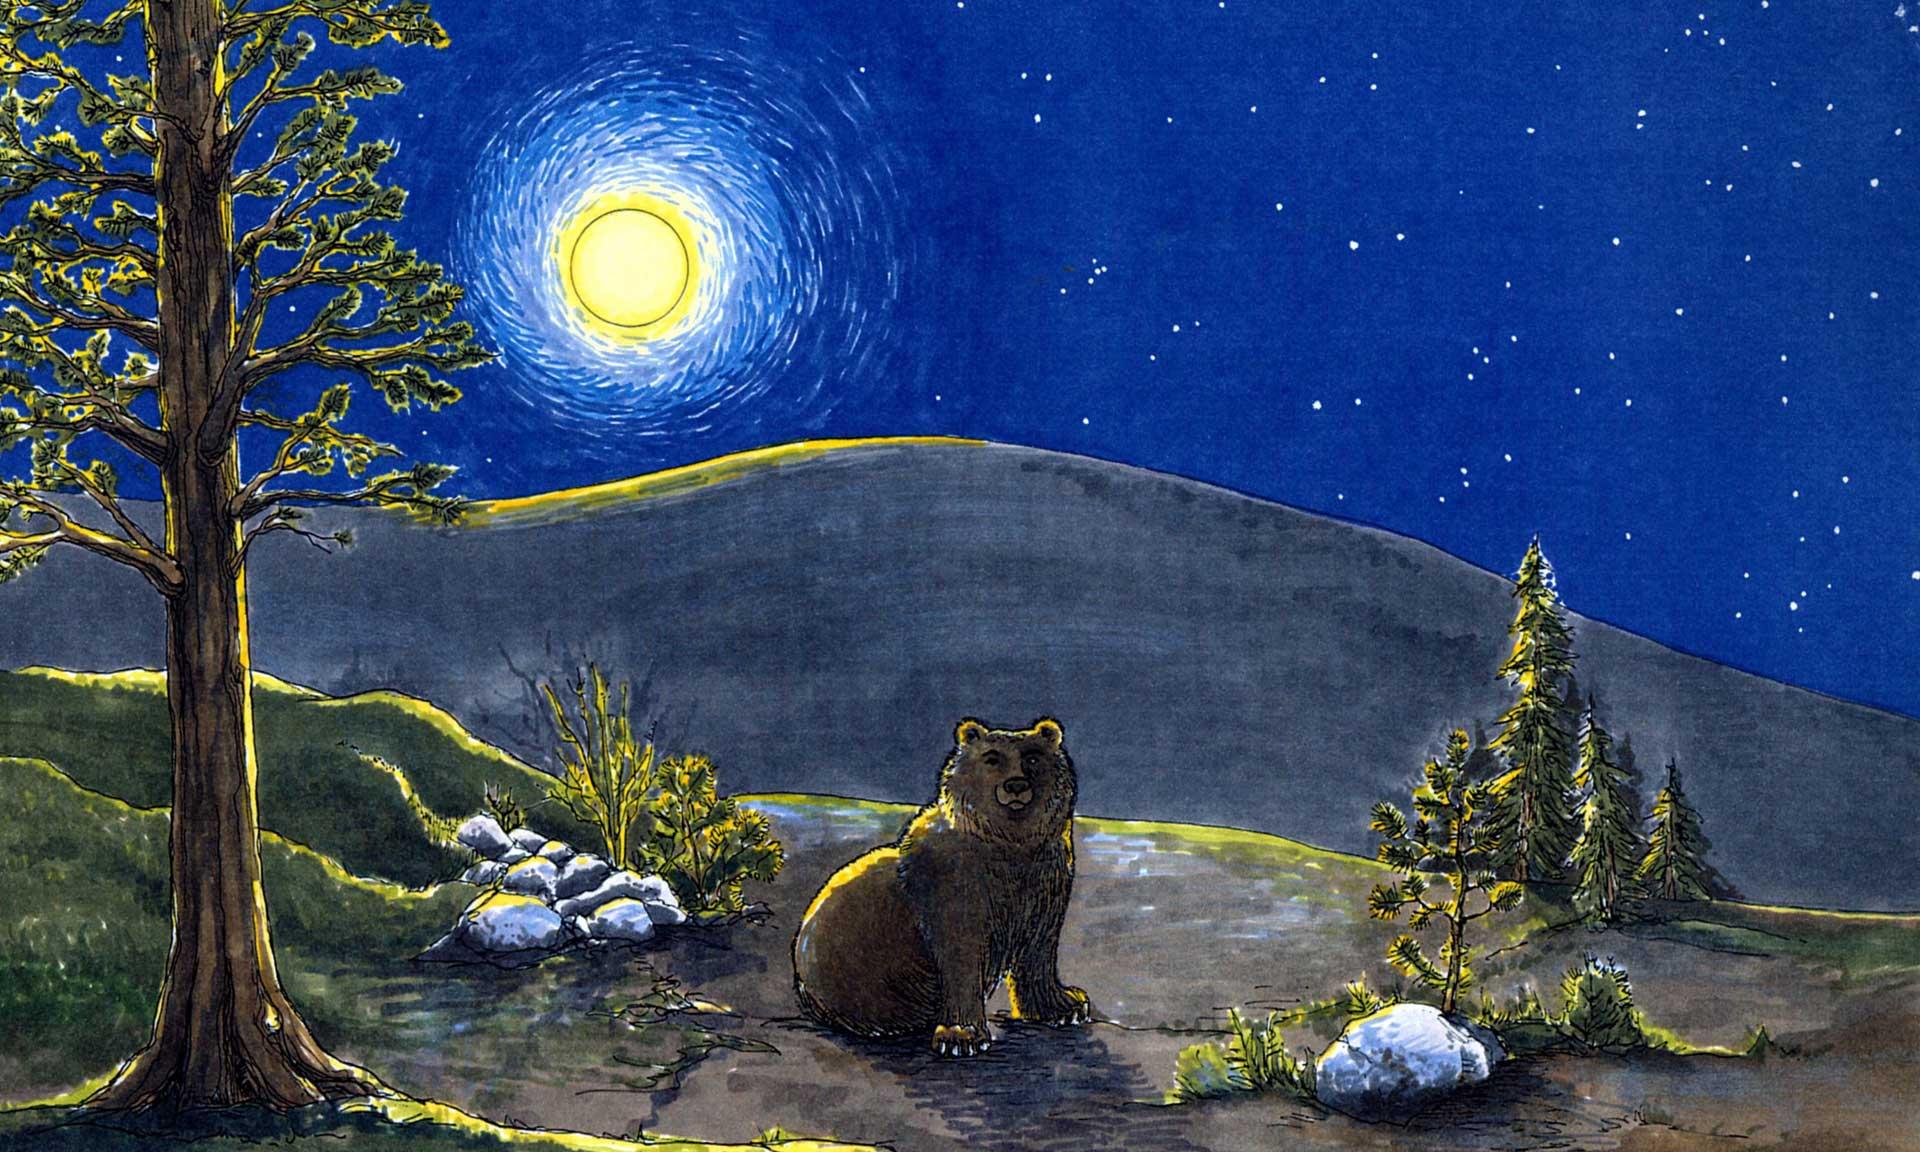 Griz The Bear